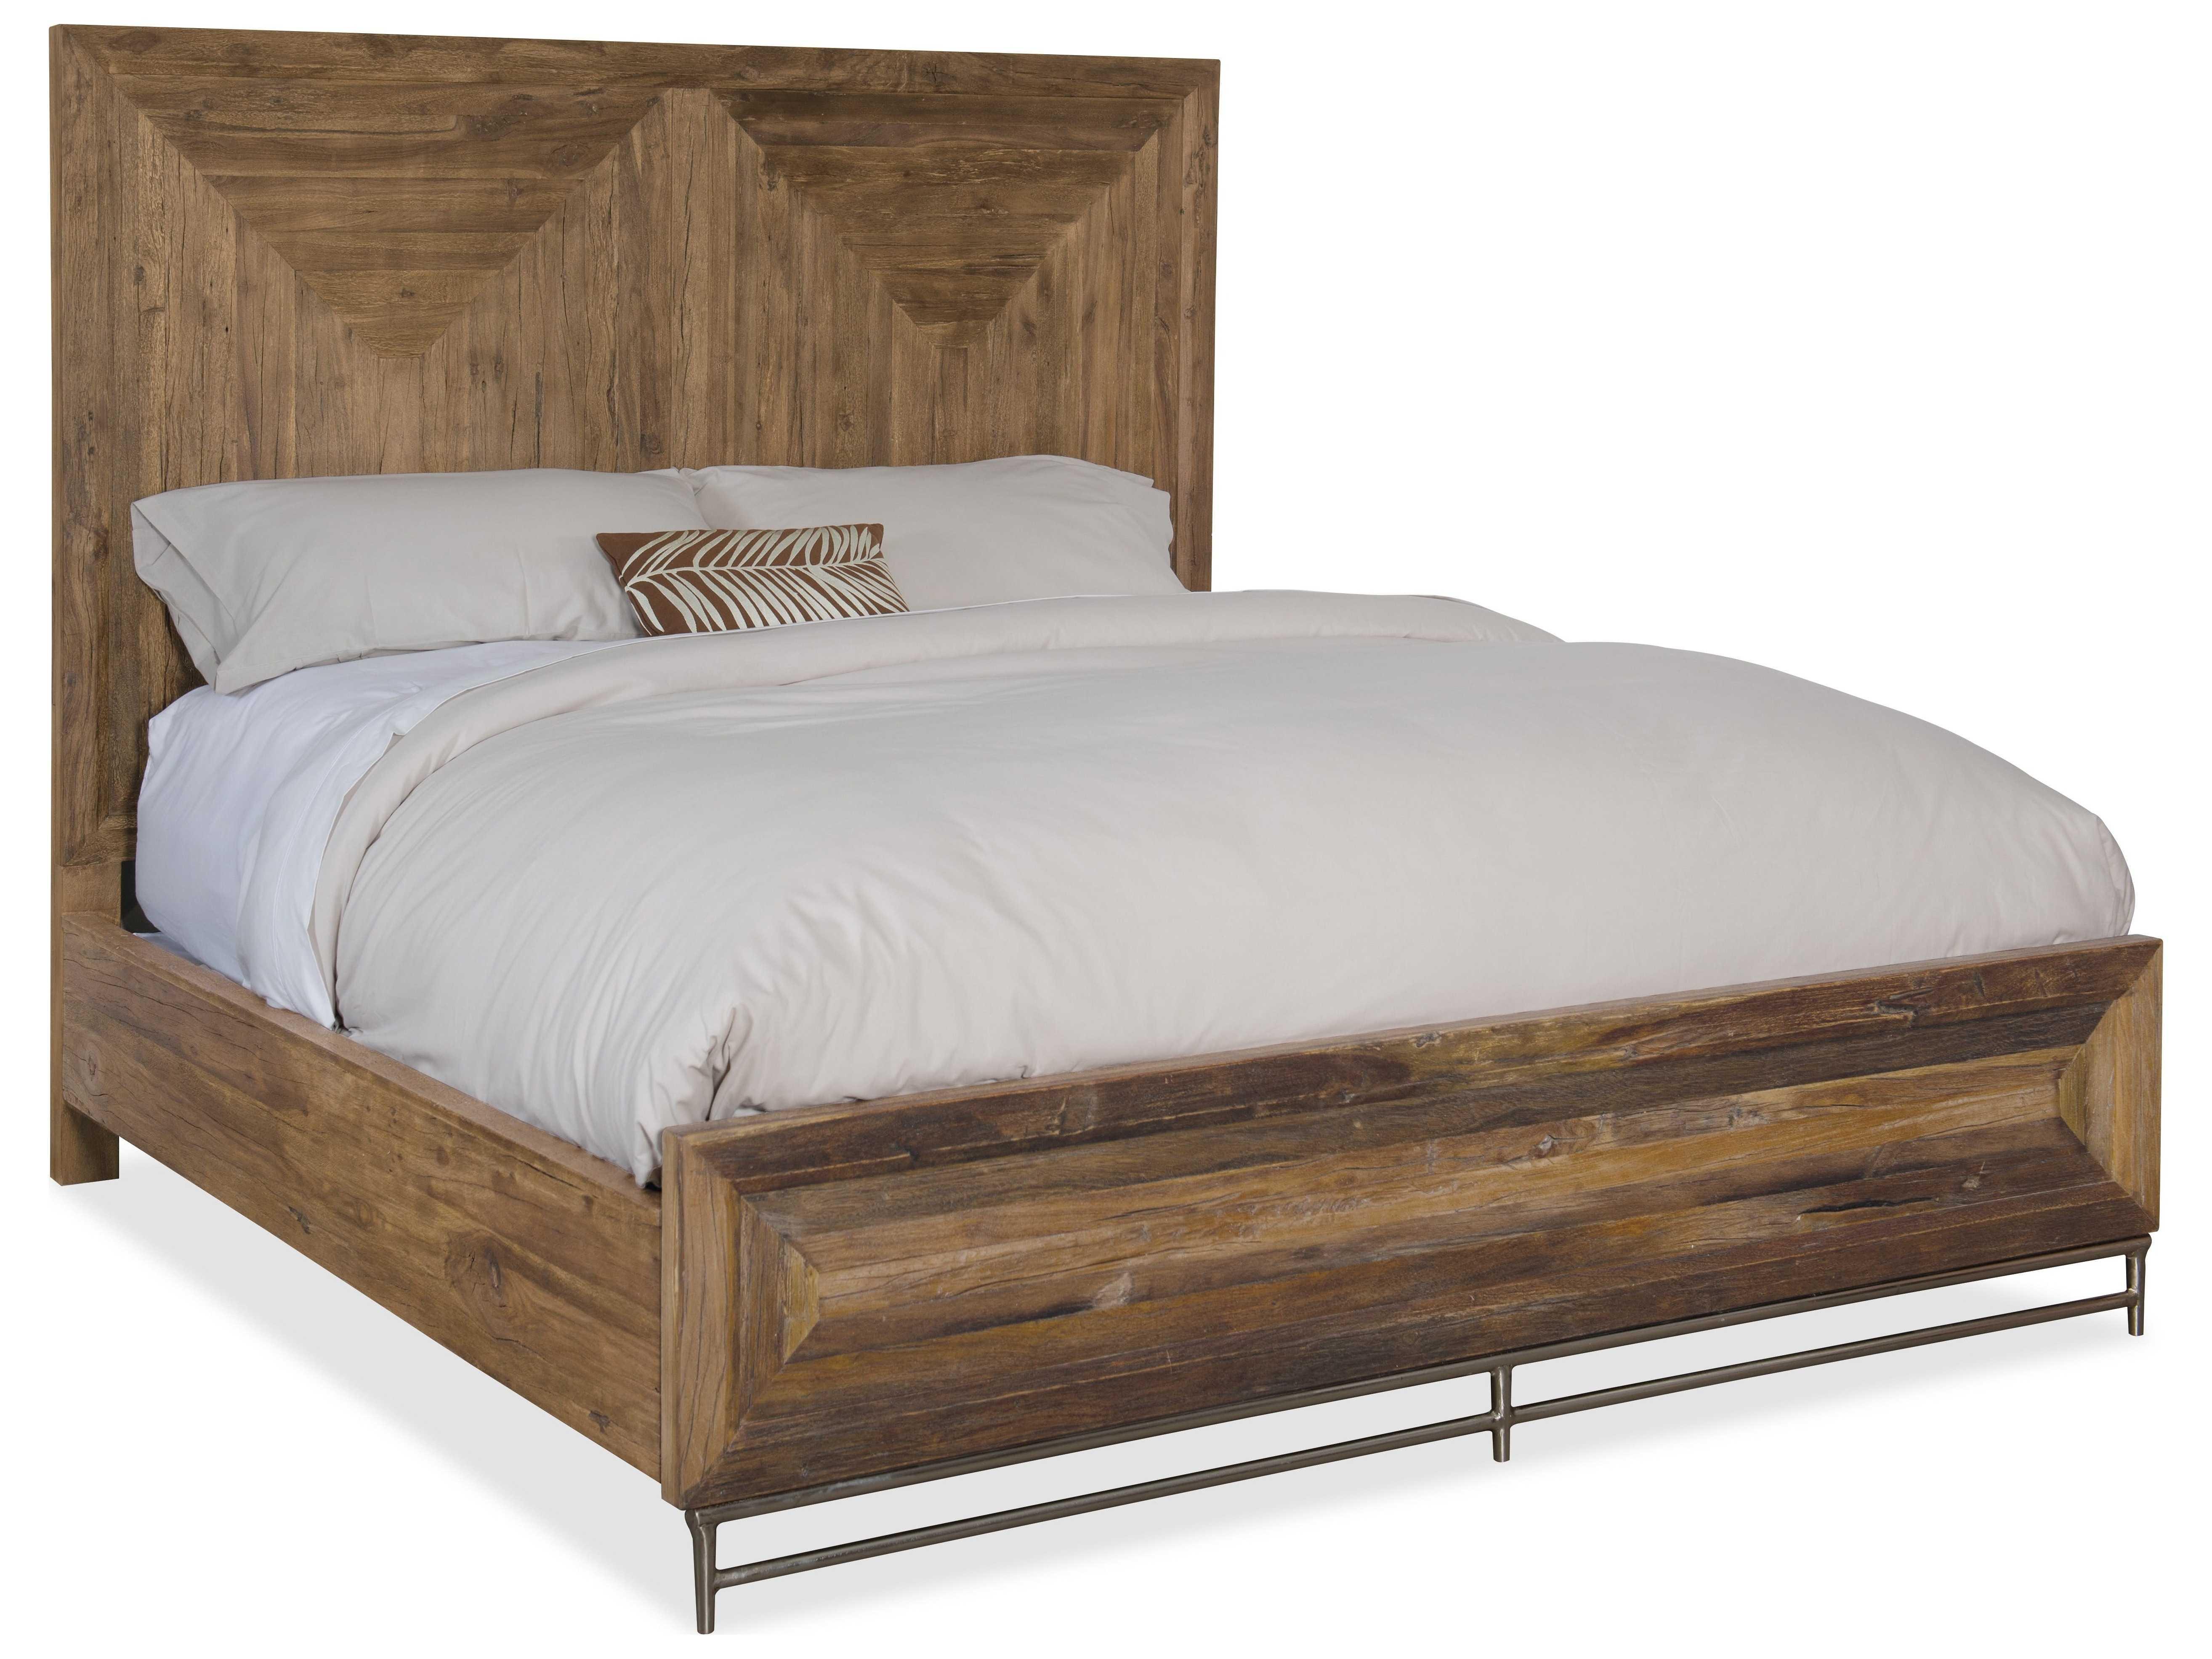 Hooker Furniture L39usine Medium Wood California King Size